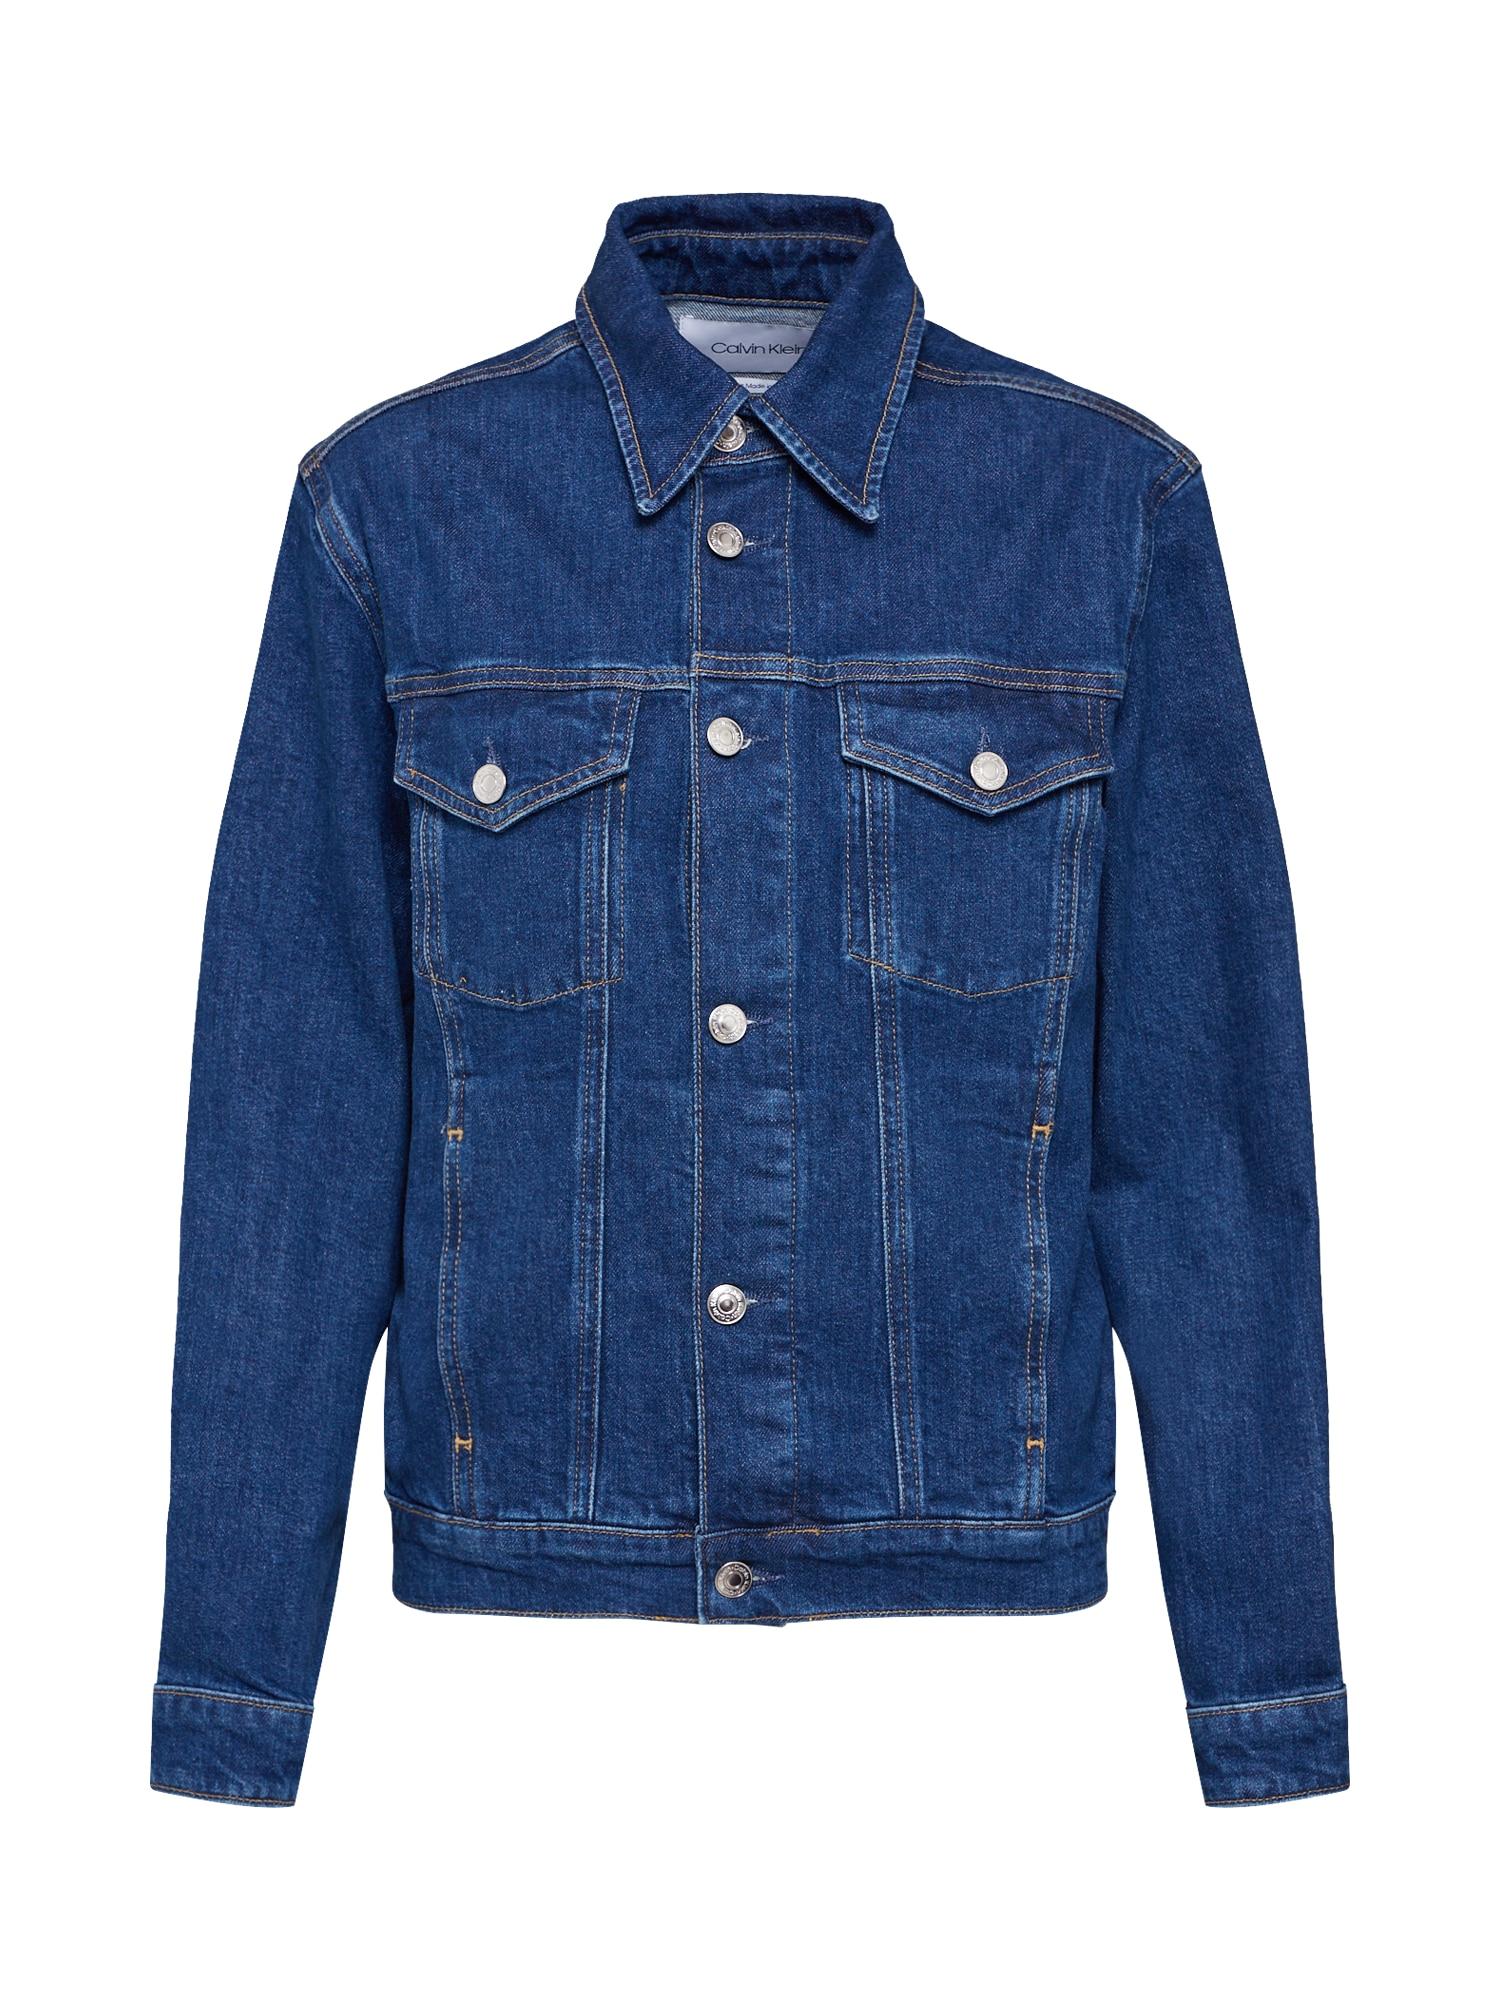 Přechodná bunda CLASSIC TRUCKER modrá džínovina Calvin Klein